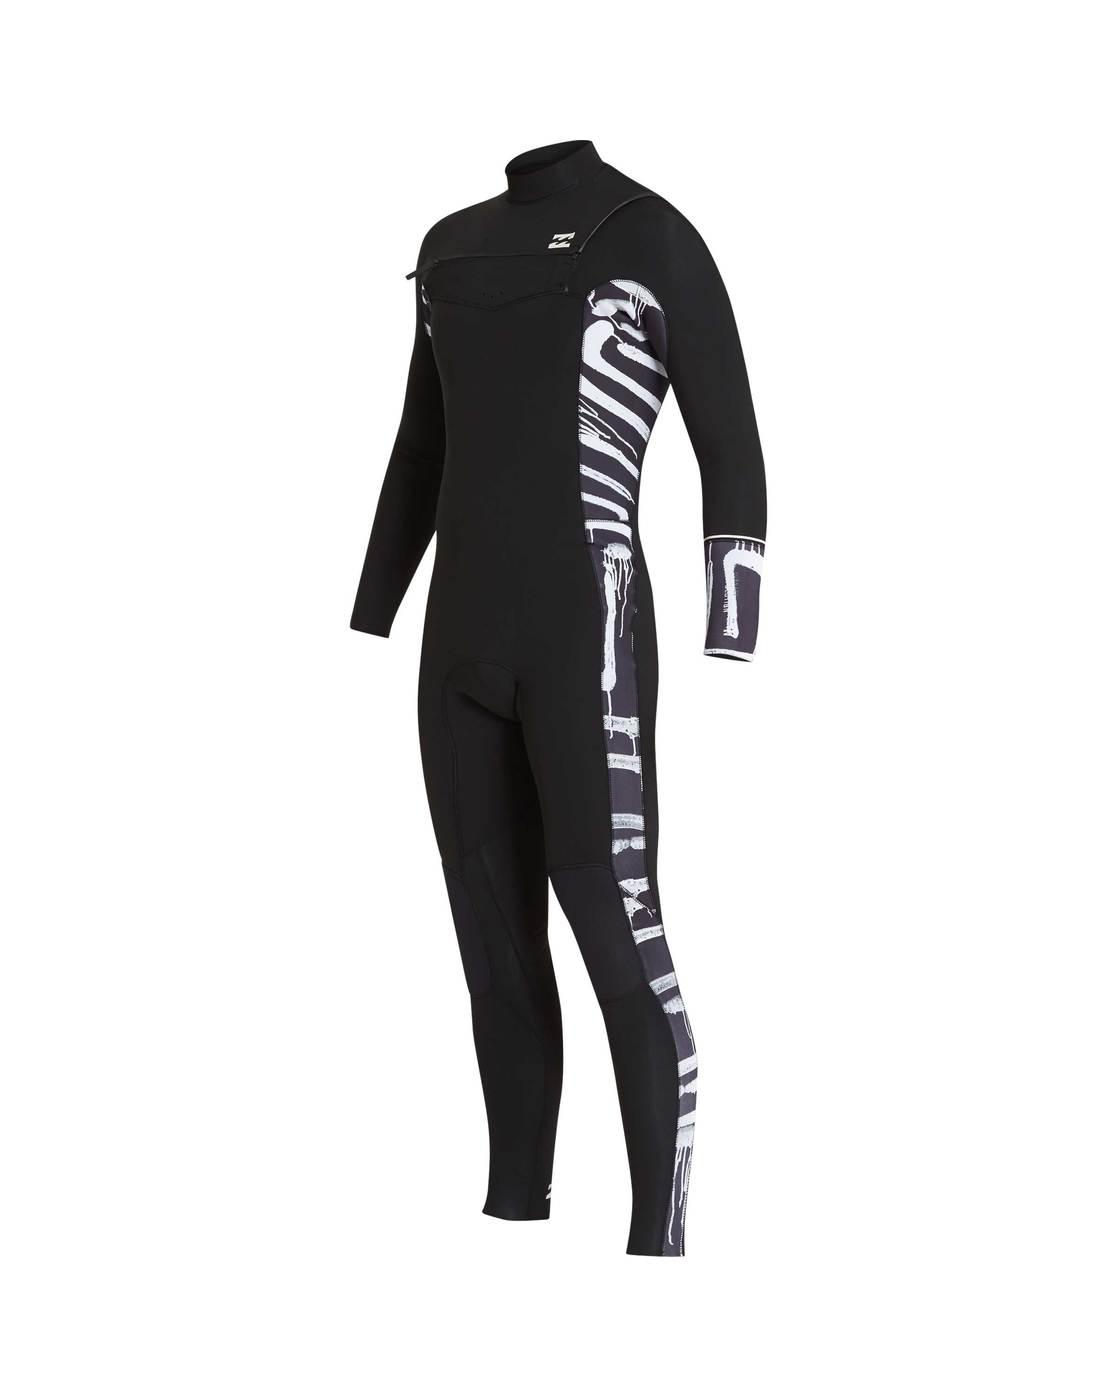 5 4 Furnace Revolution Chest Zip Wetsuit 3664564222956